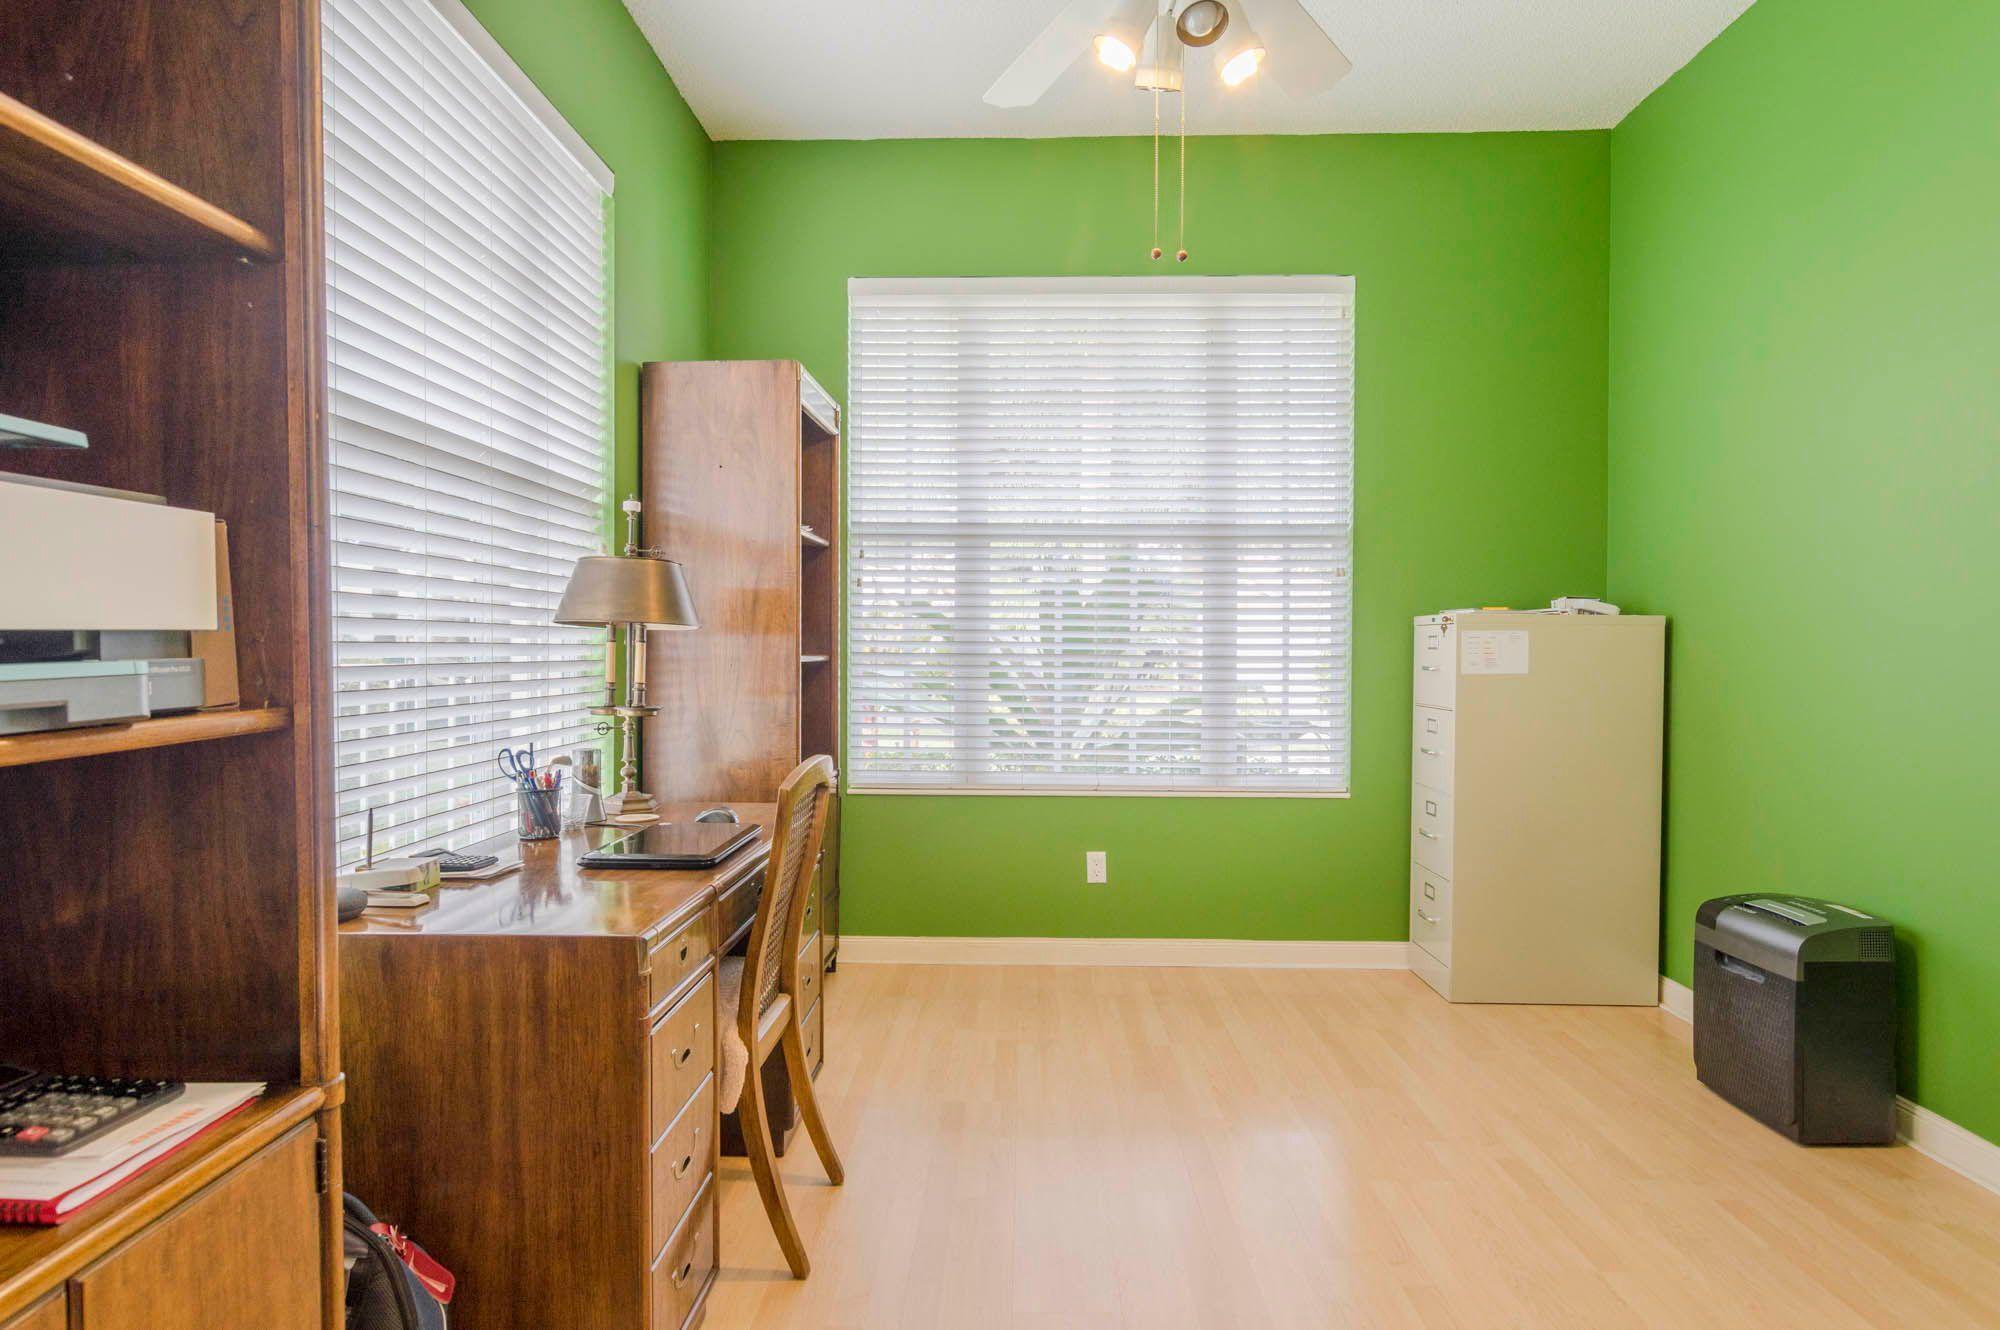 788384a4da7797841bfa3df288b4fc98 - Rooms For Rent Palm Beach Gardens Fl